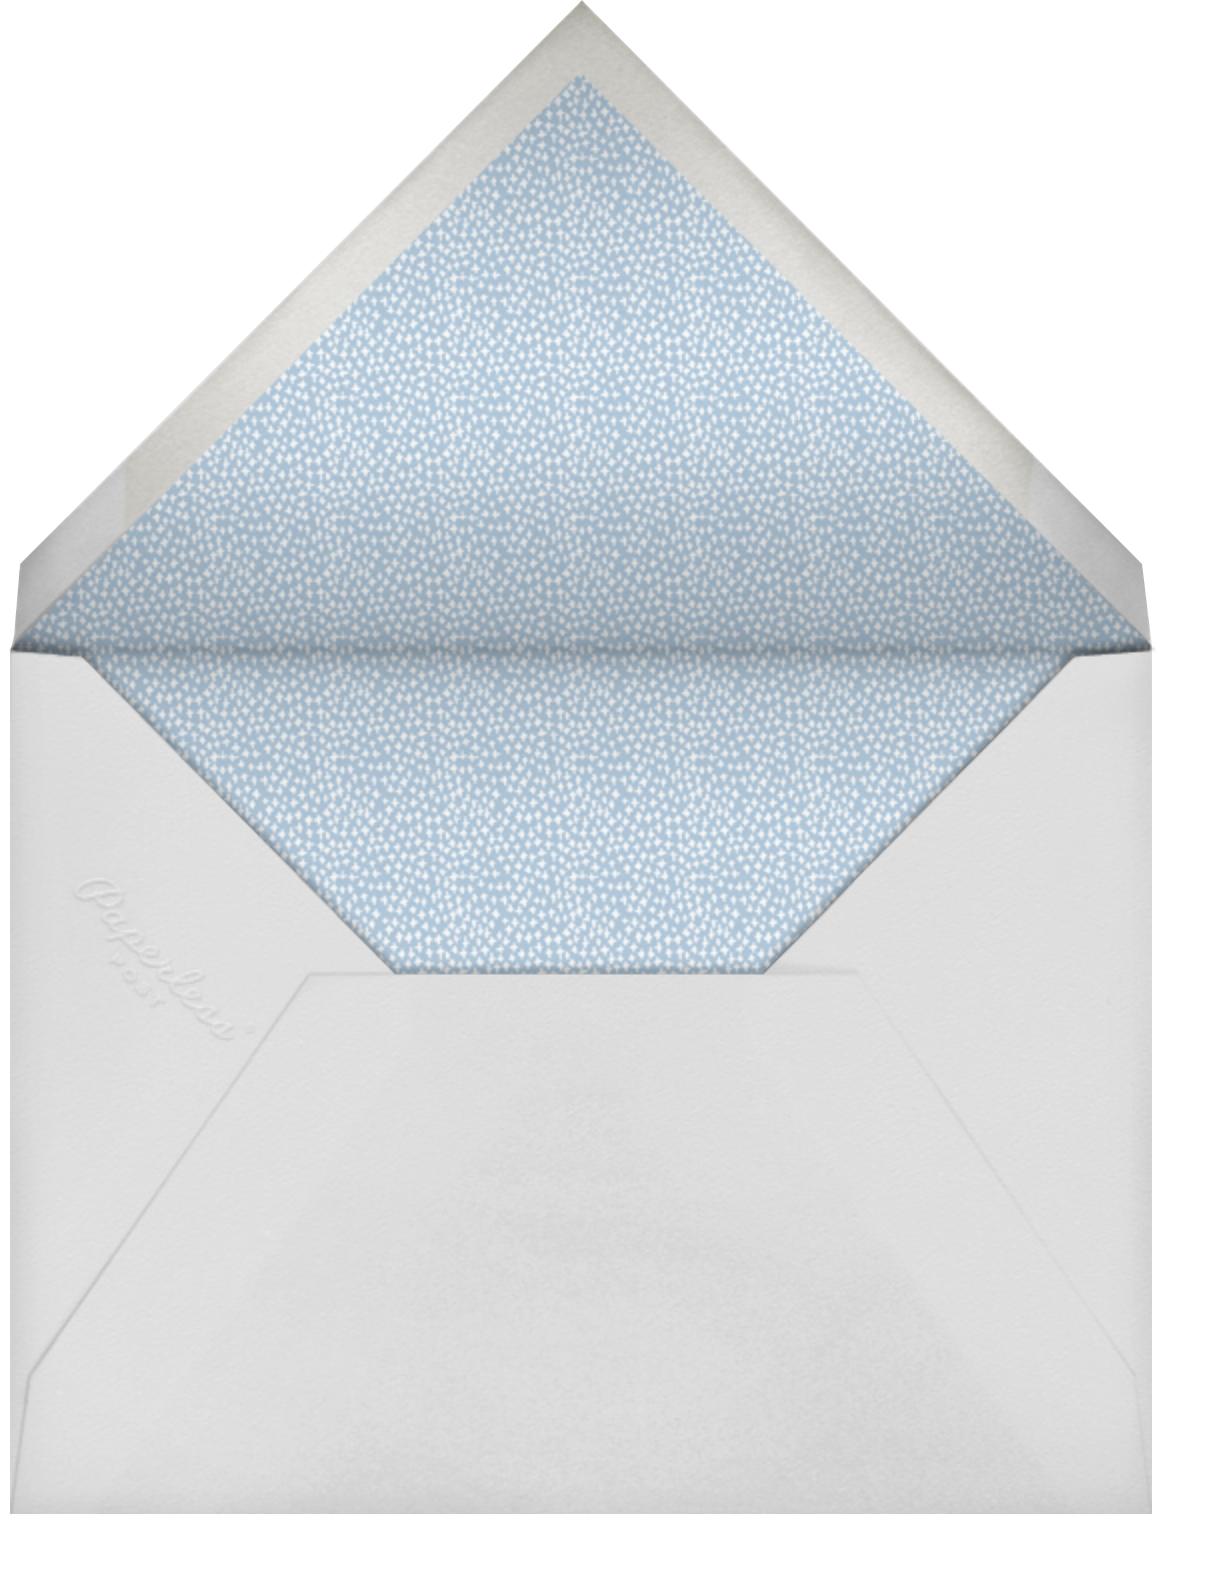 Among the Daisies - Tundra - Mr. Boddington's Studio - Thank you - envelope back